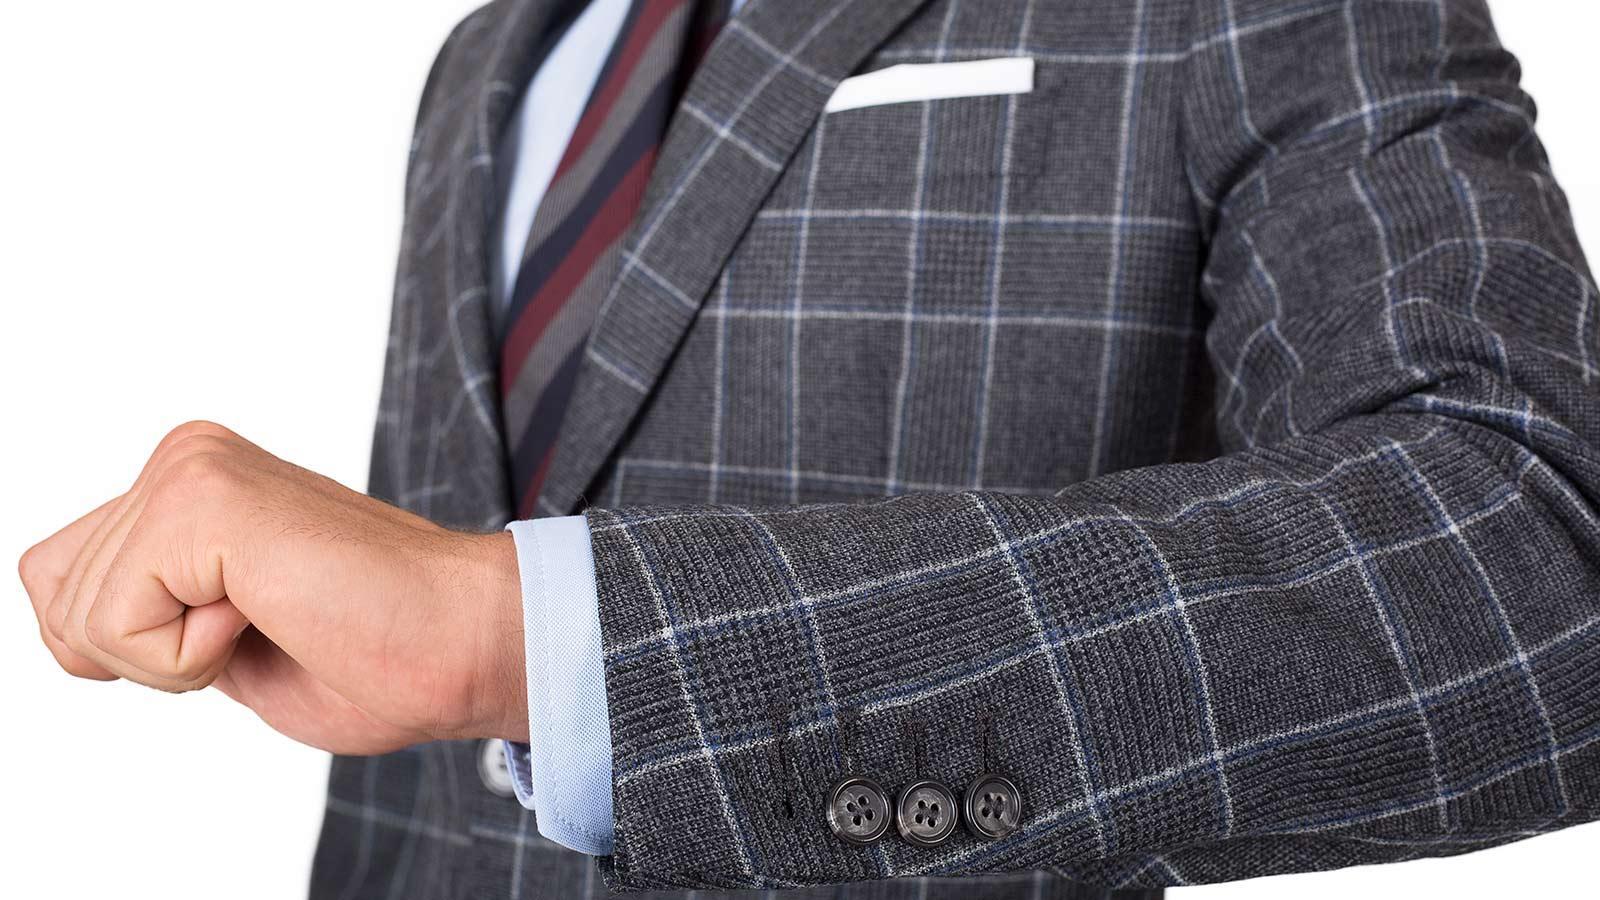 Grey Plaid Wool Flannel Suit - slider image 1